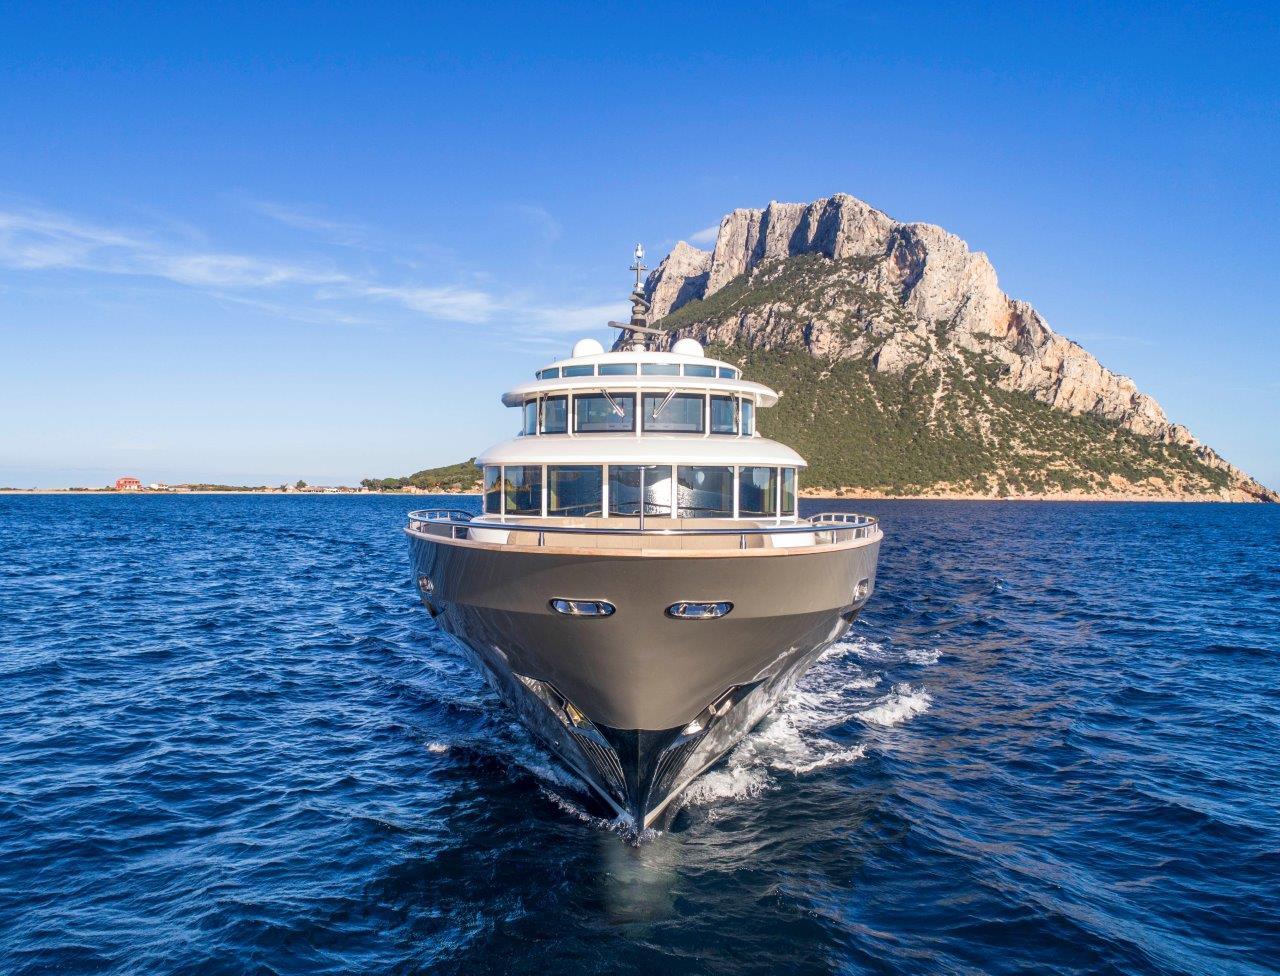 Filippetti Yacht N26 Maxima - Bow View